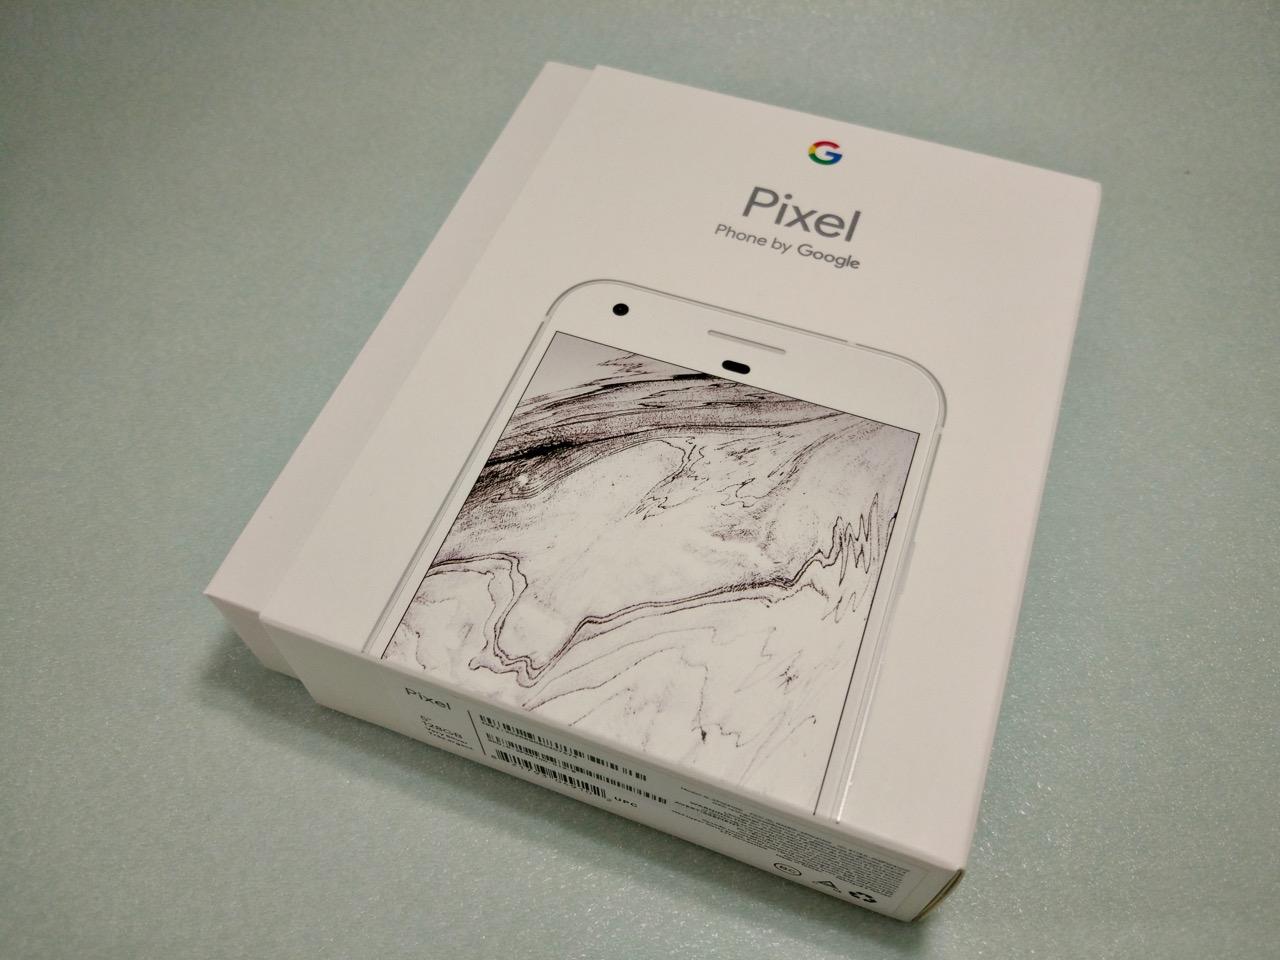 google-pixel-review-retail-packaging